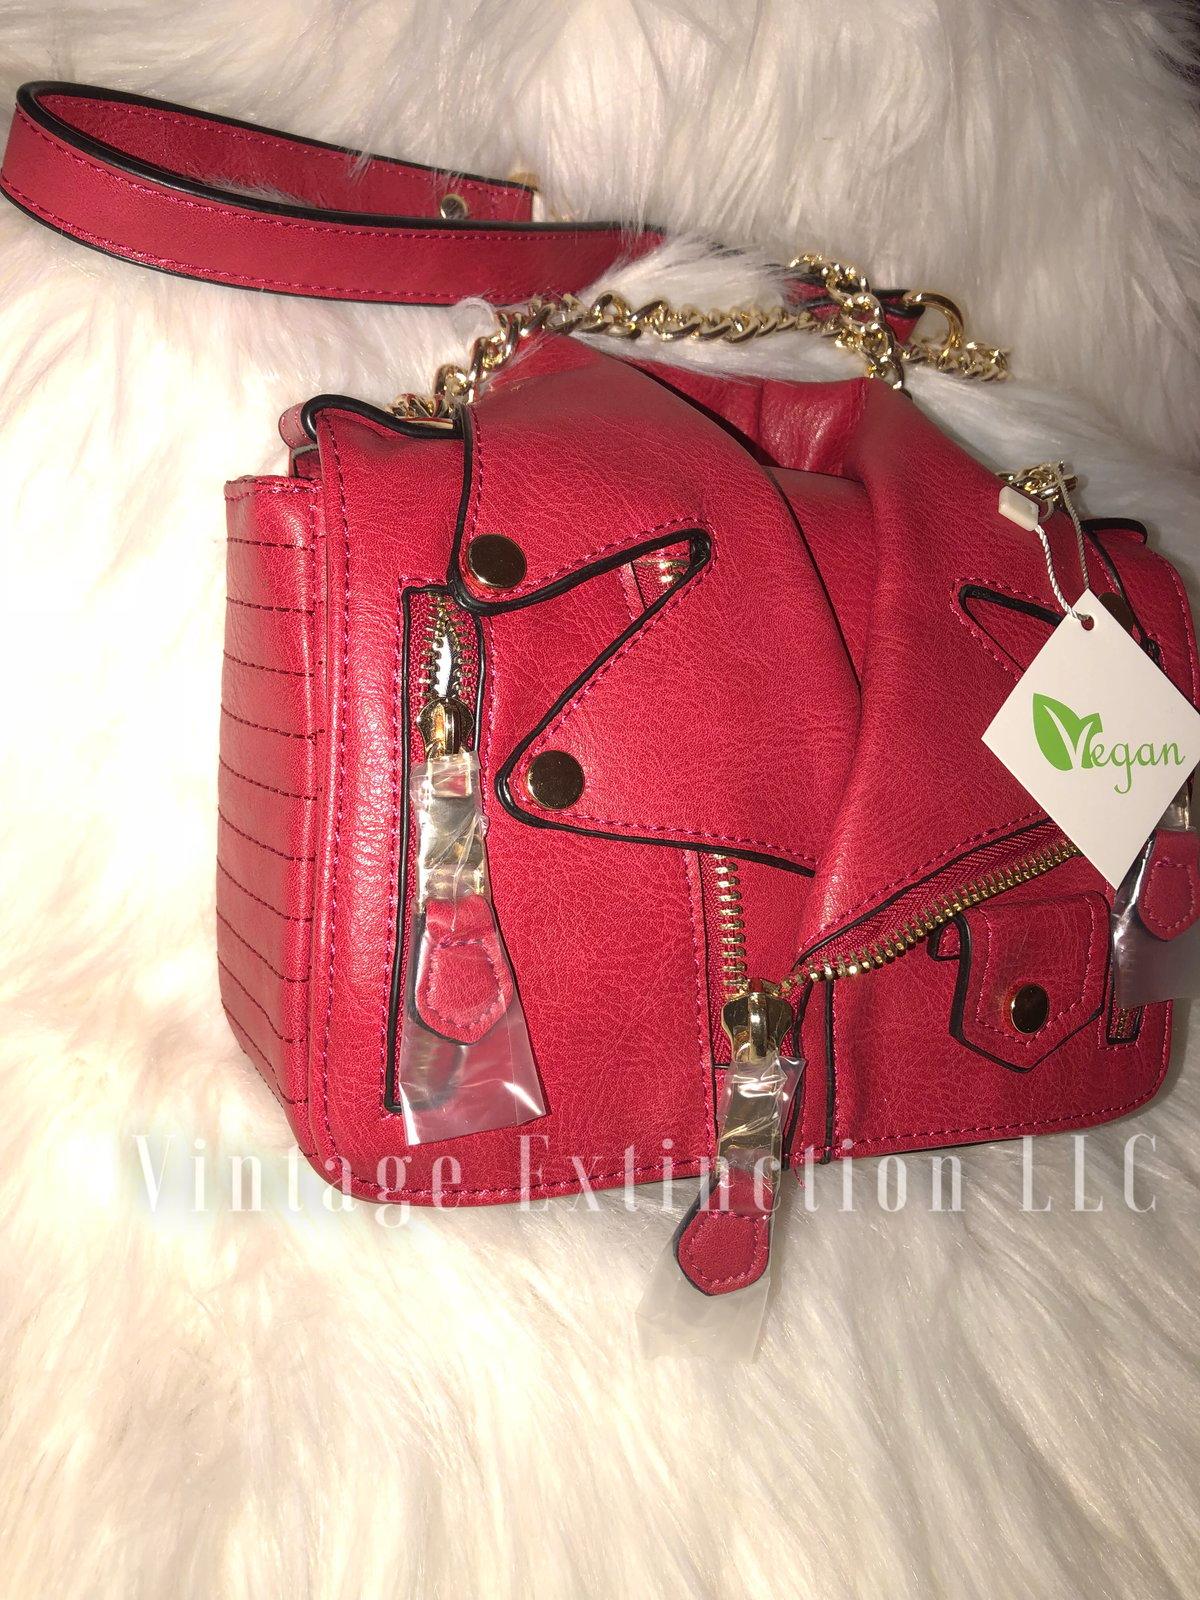 Image of Vegan Leather Motorcycle Jacket Bag